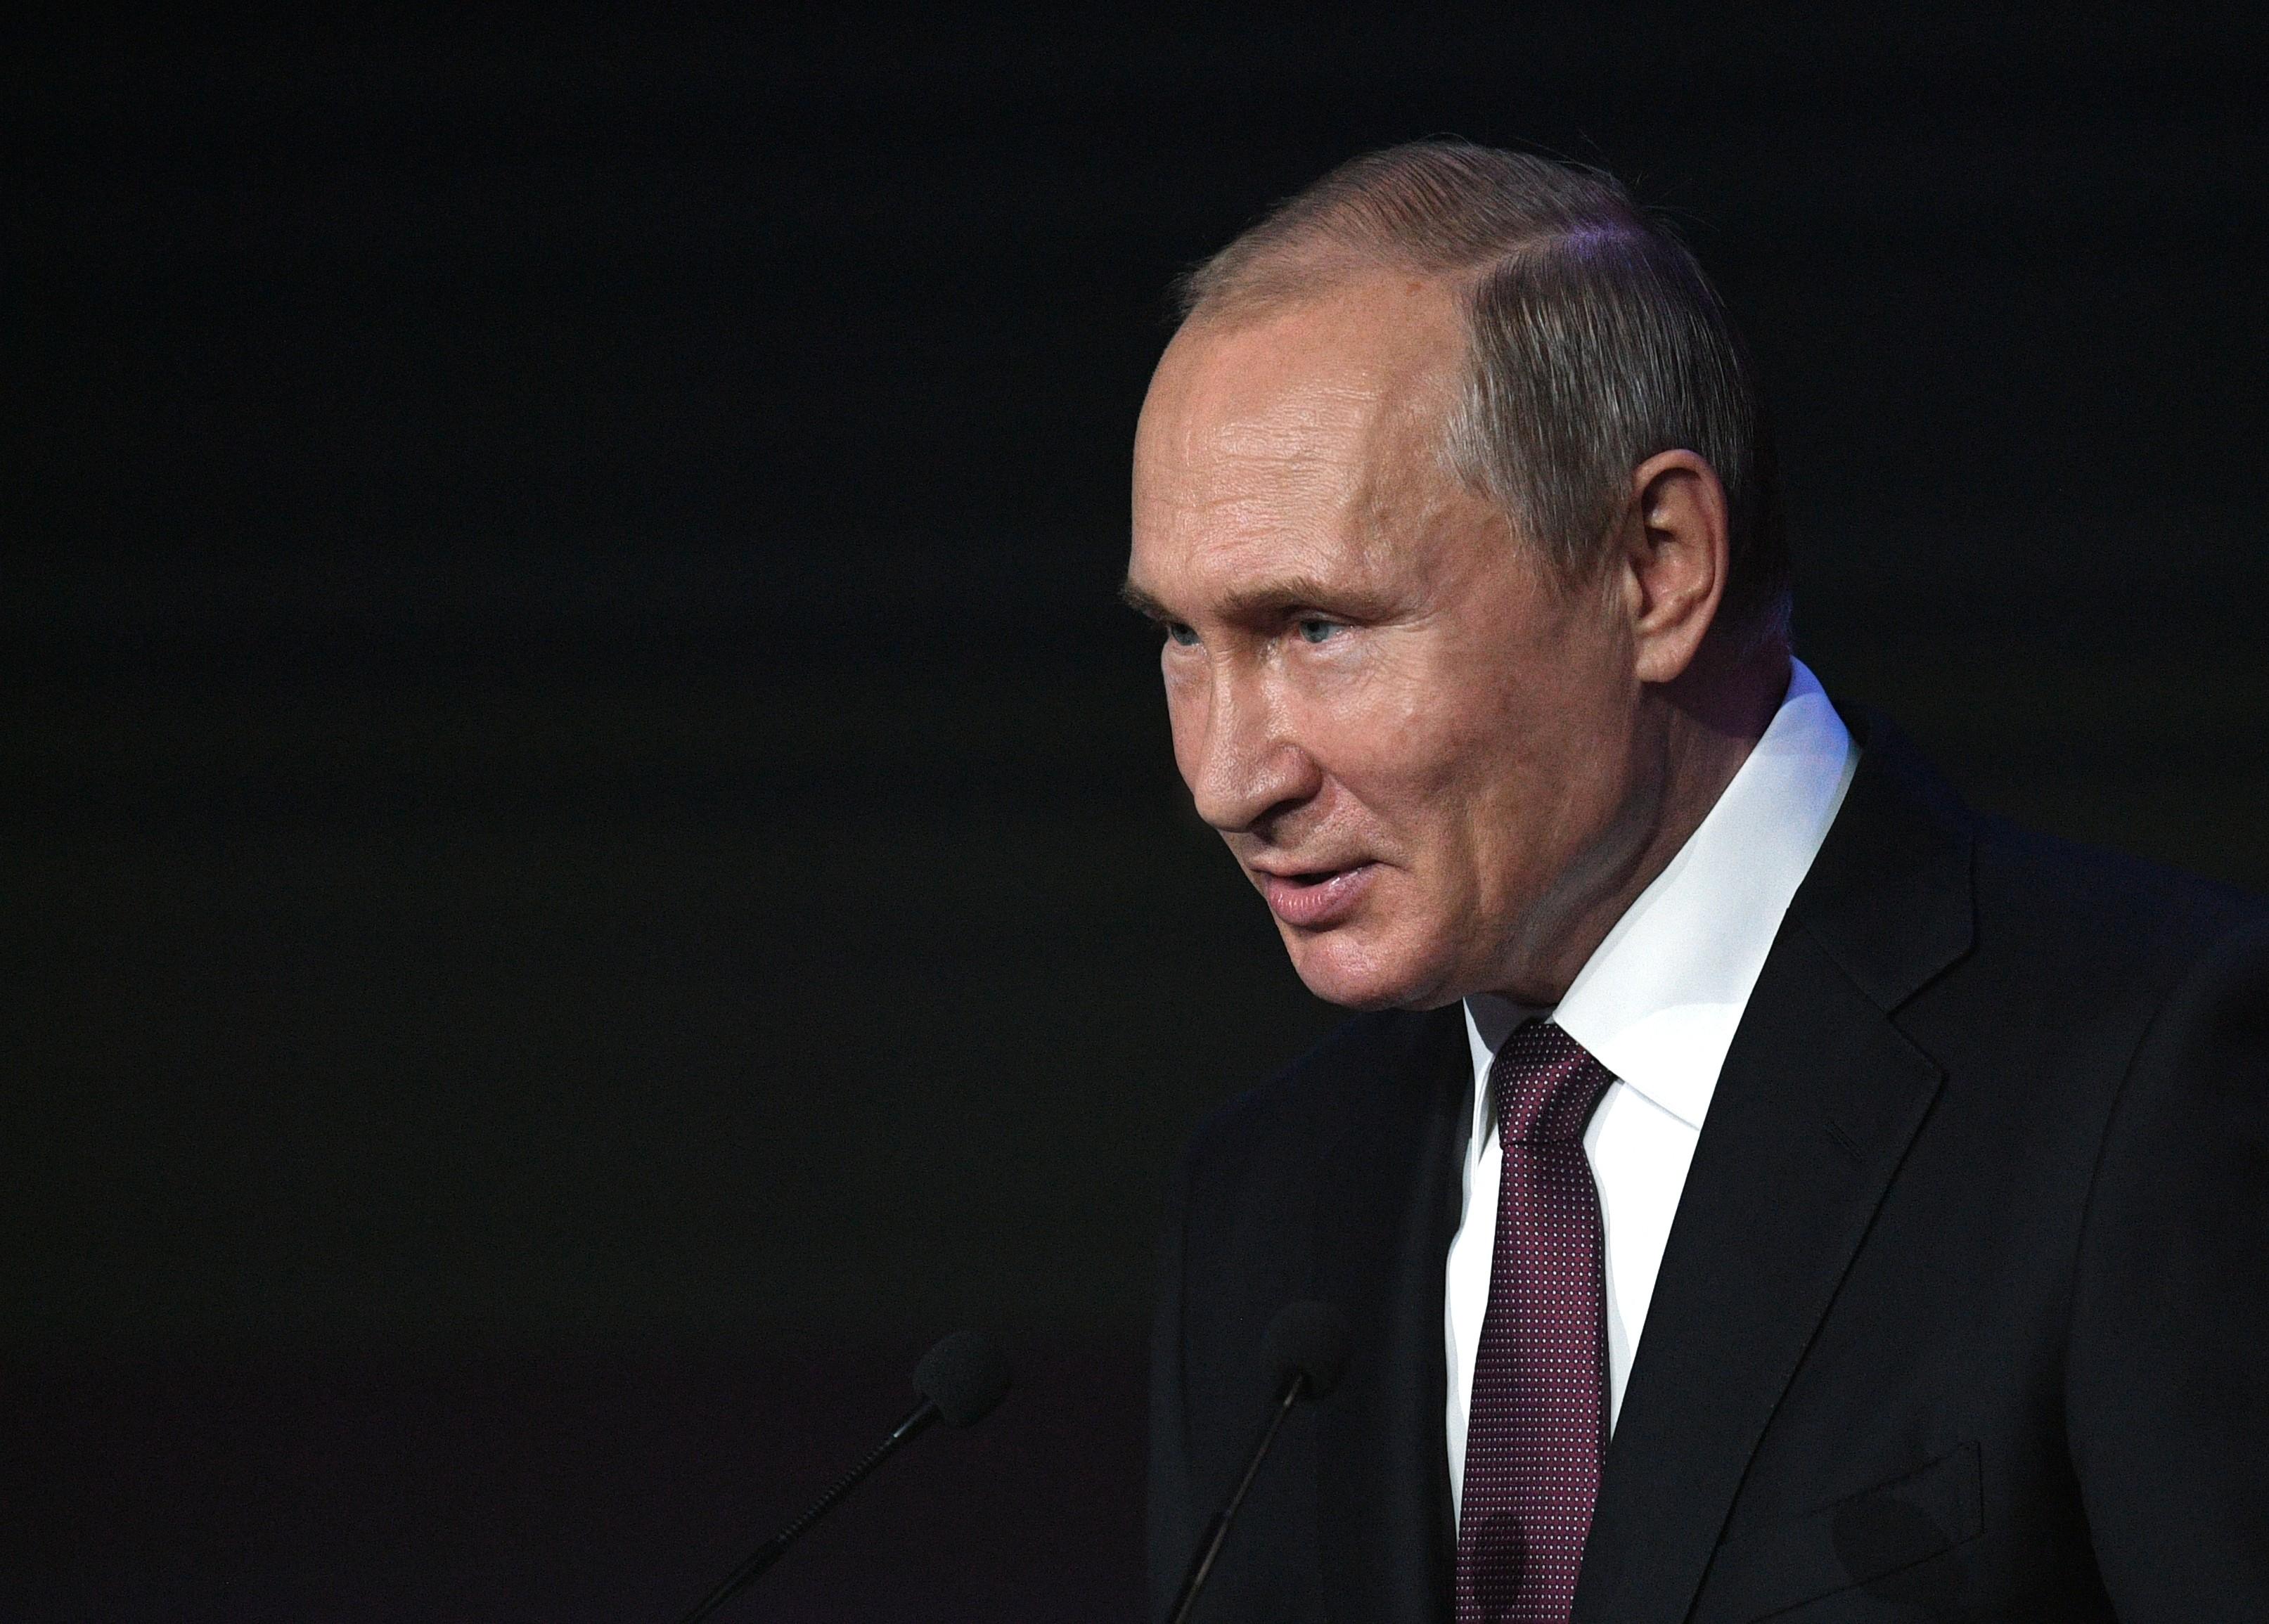 <p>Владимир Путин. Фото: &copy;РИА Новости/Валерий Мельников</p>